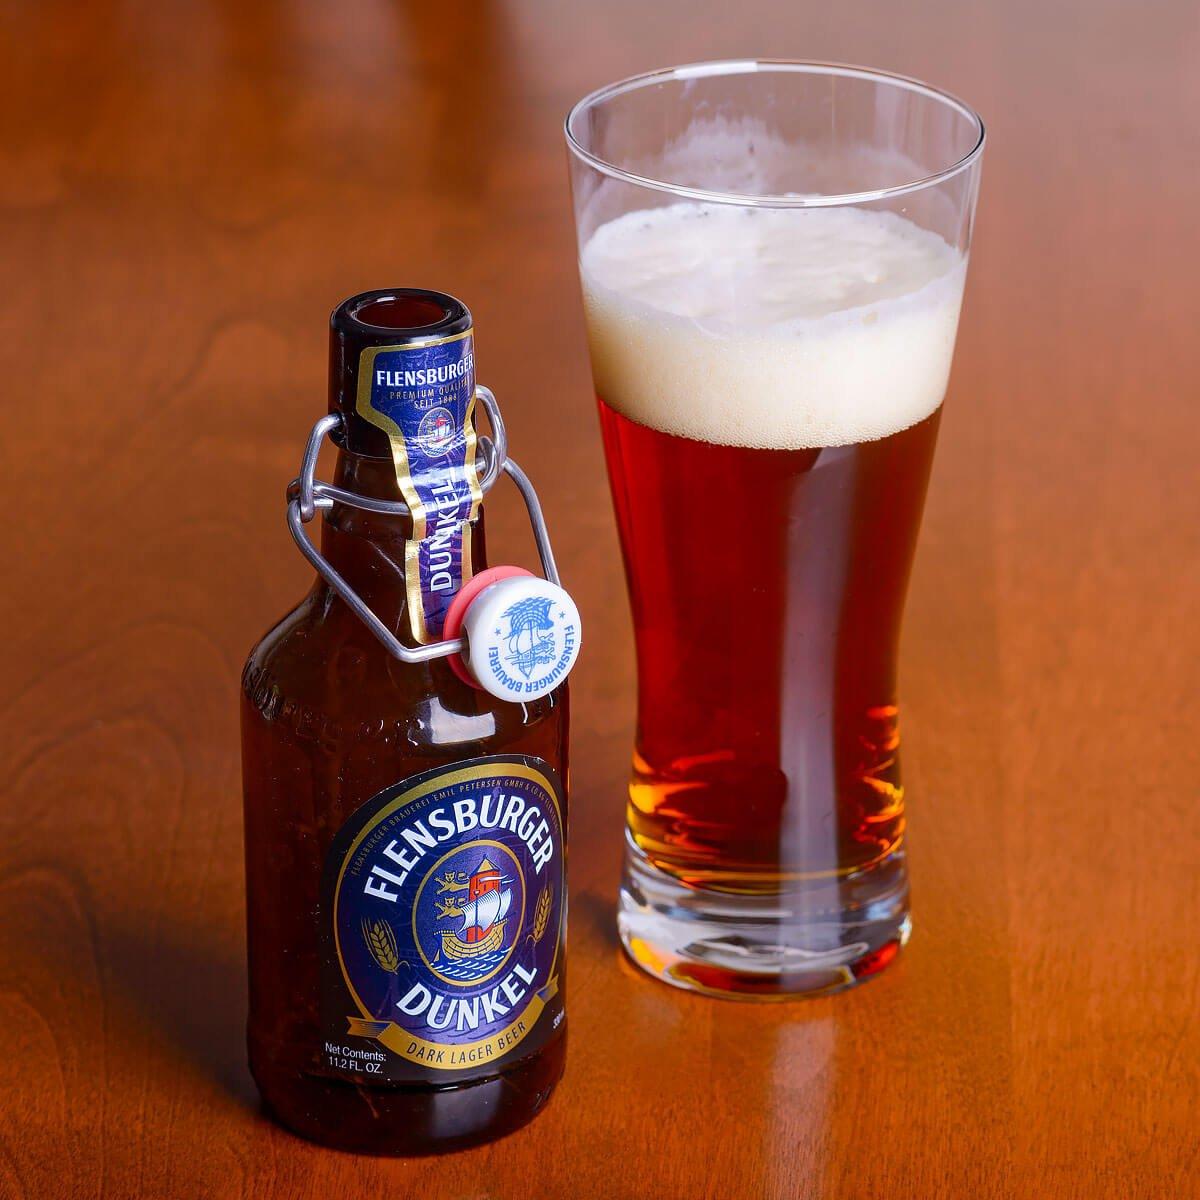 Flensburger Dunkel, a Munich Dunkel brewed by Flensburger Brauerei GmbH Und Co. KG